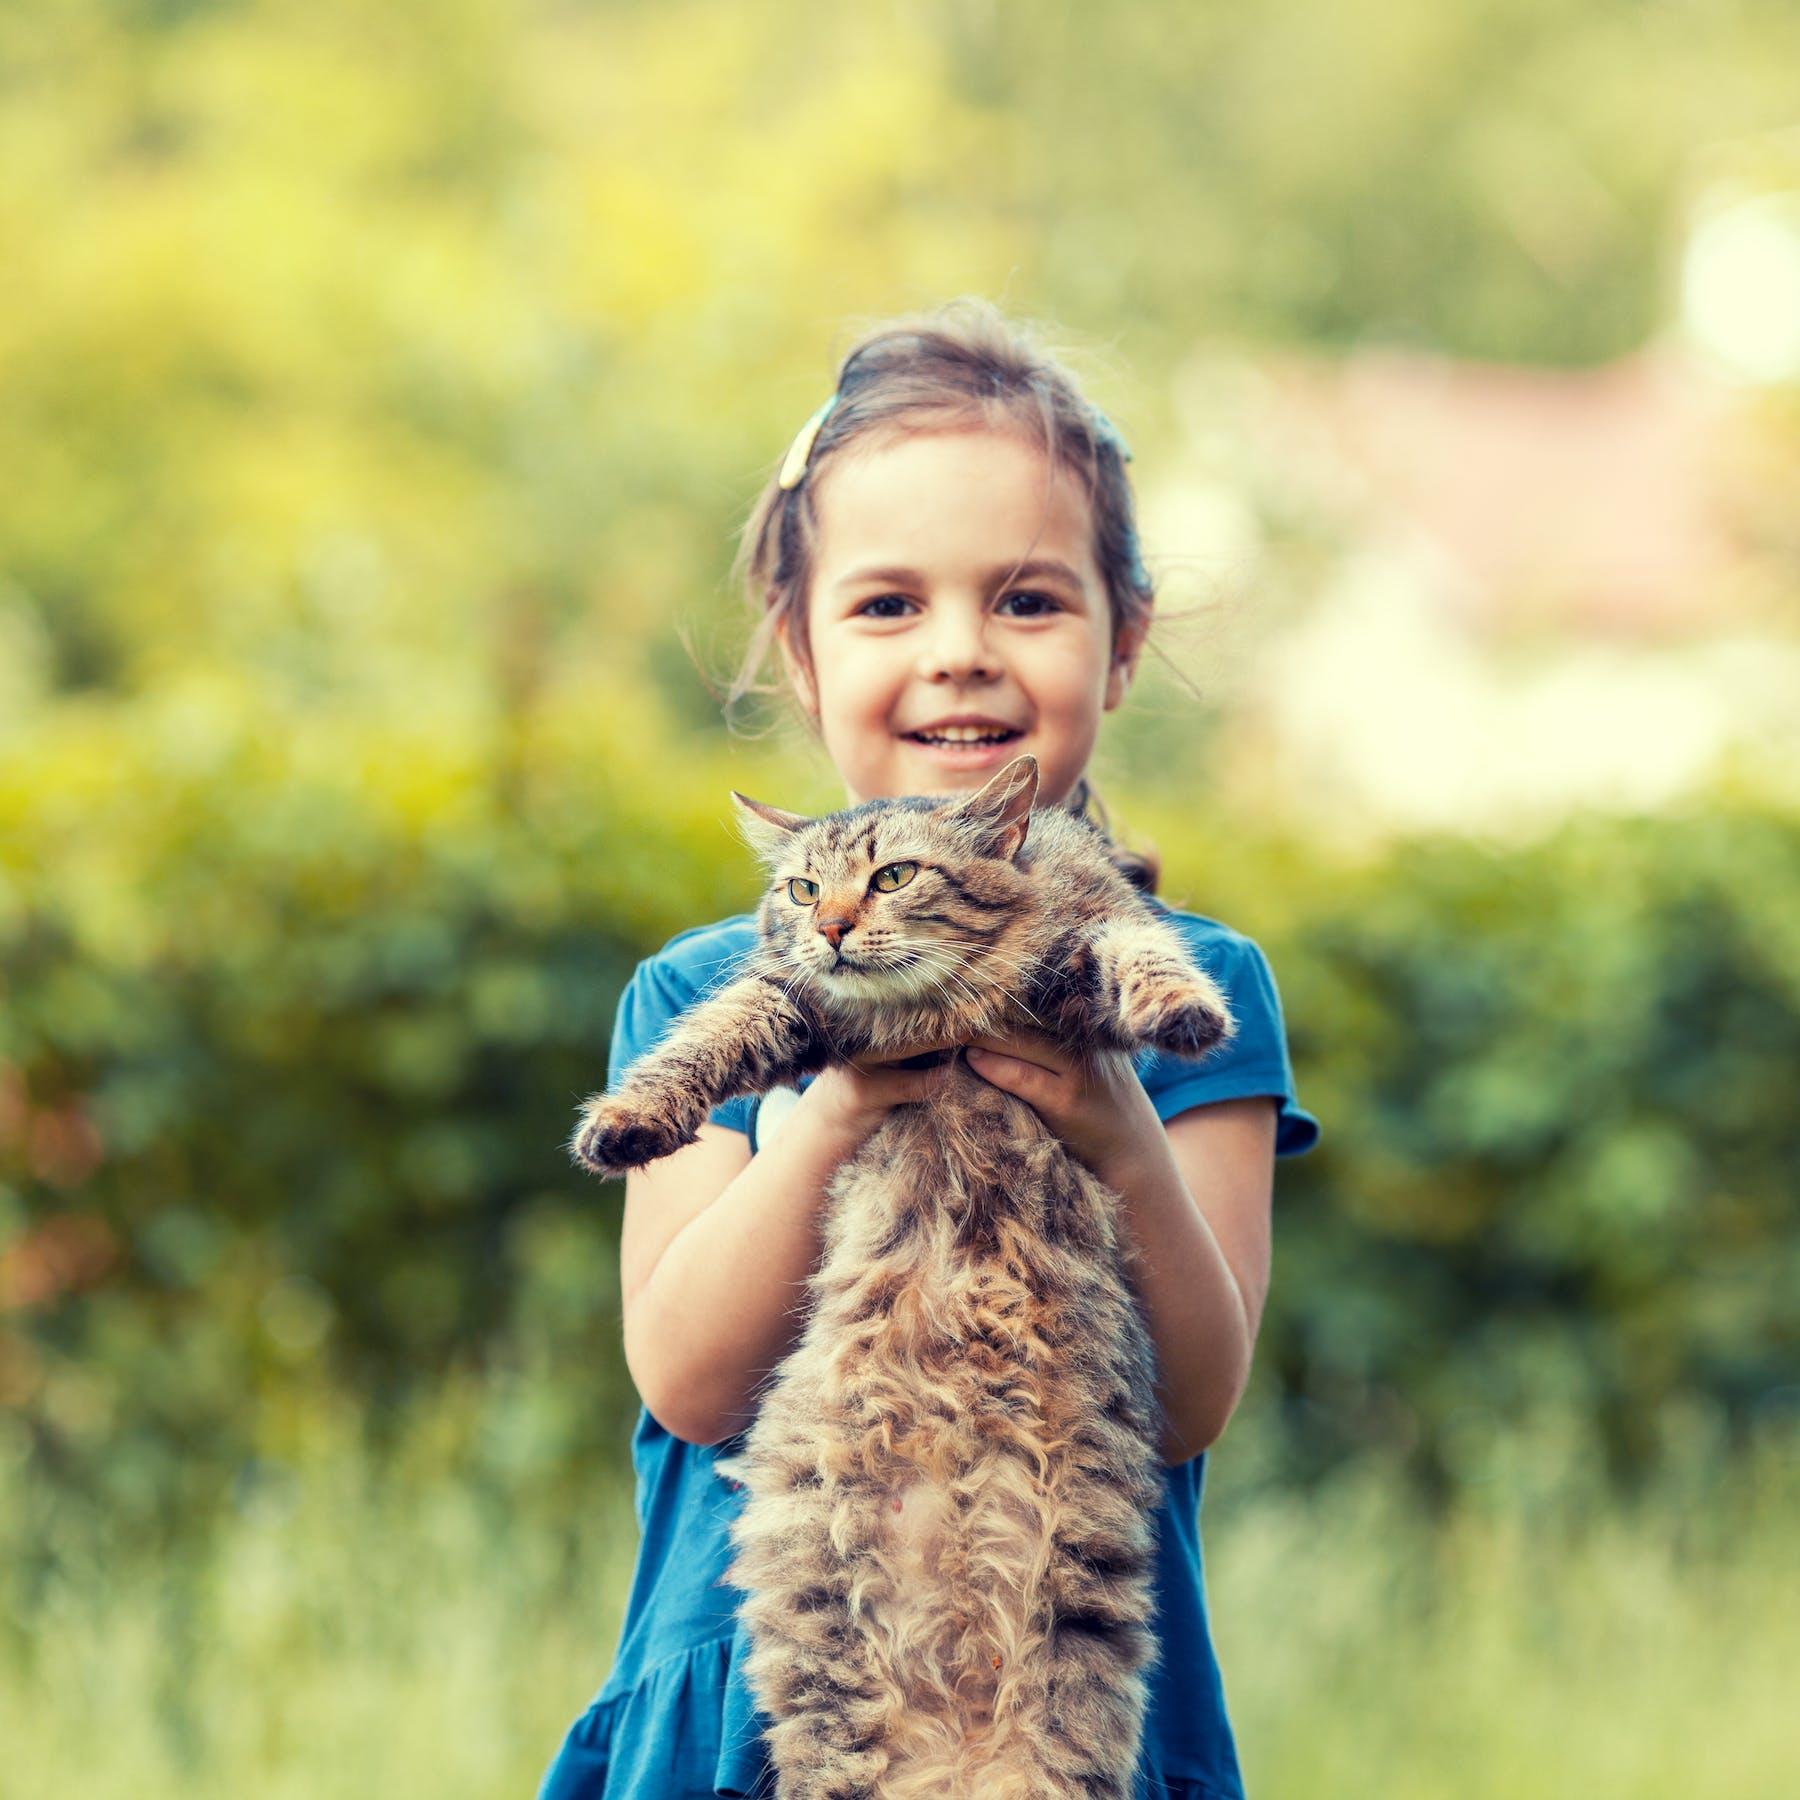 Child Picking Up Cat